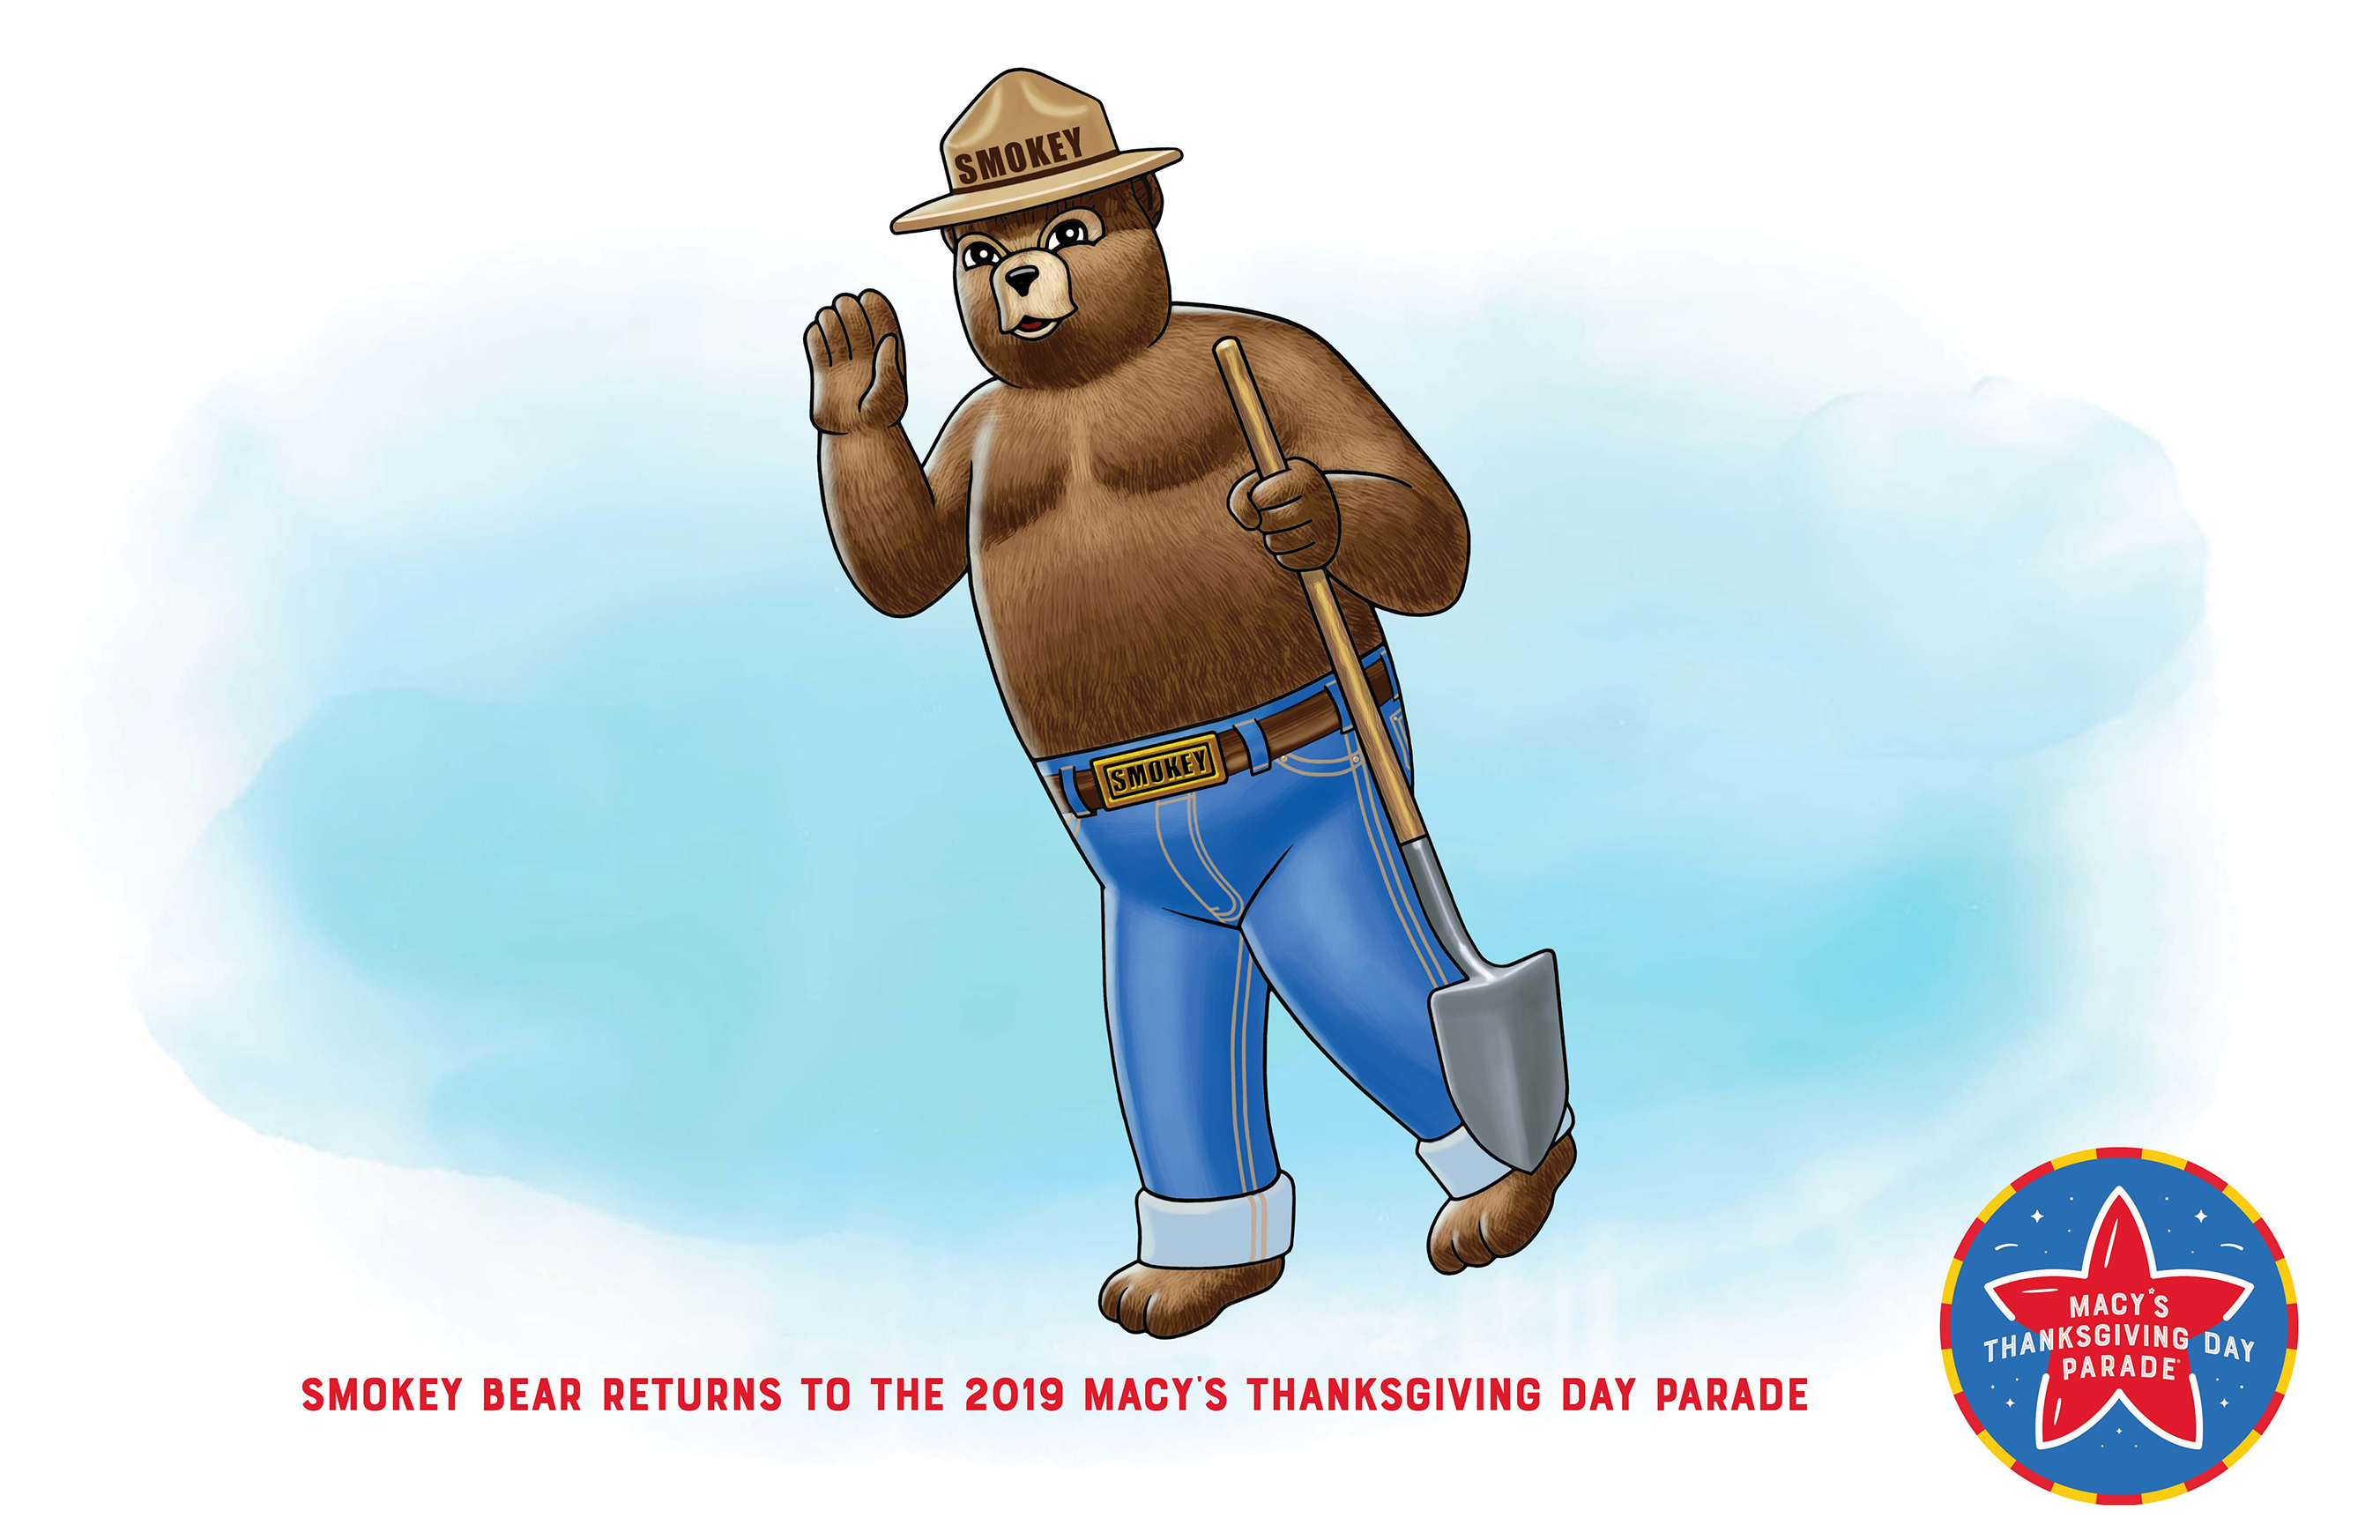 Smokey Bear returns to the 2019 Macy's Thanksgiving Day Parade